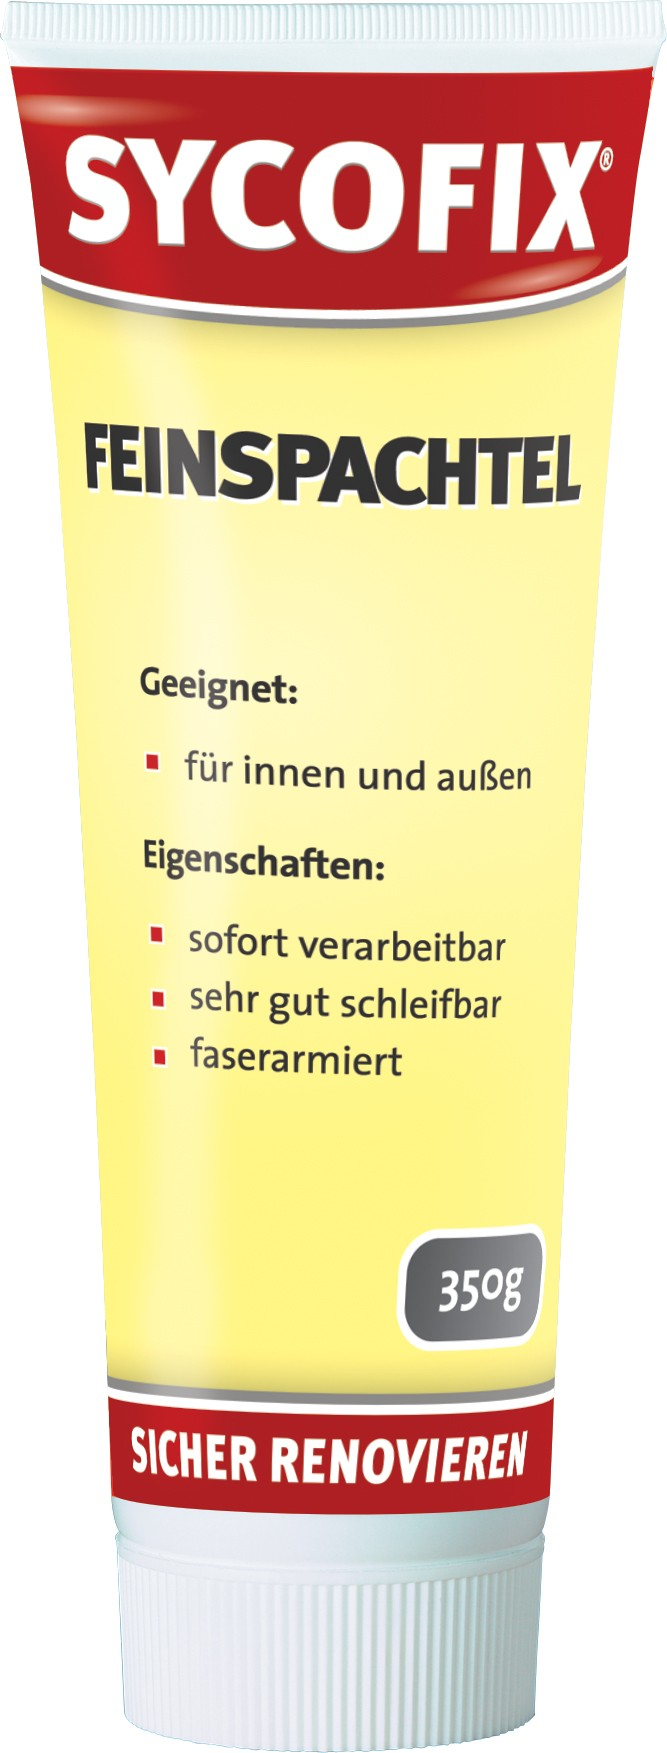 Sycofix - Feinspachtel 350g